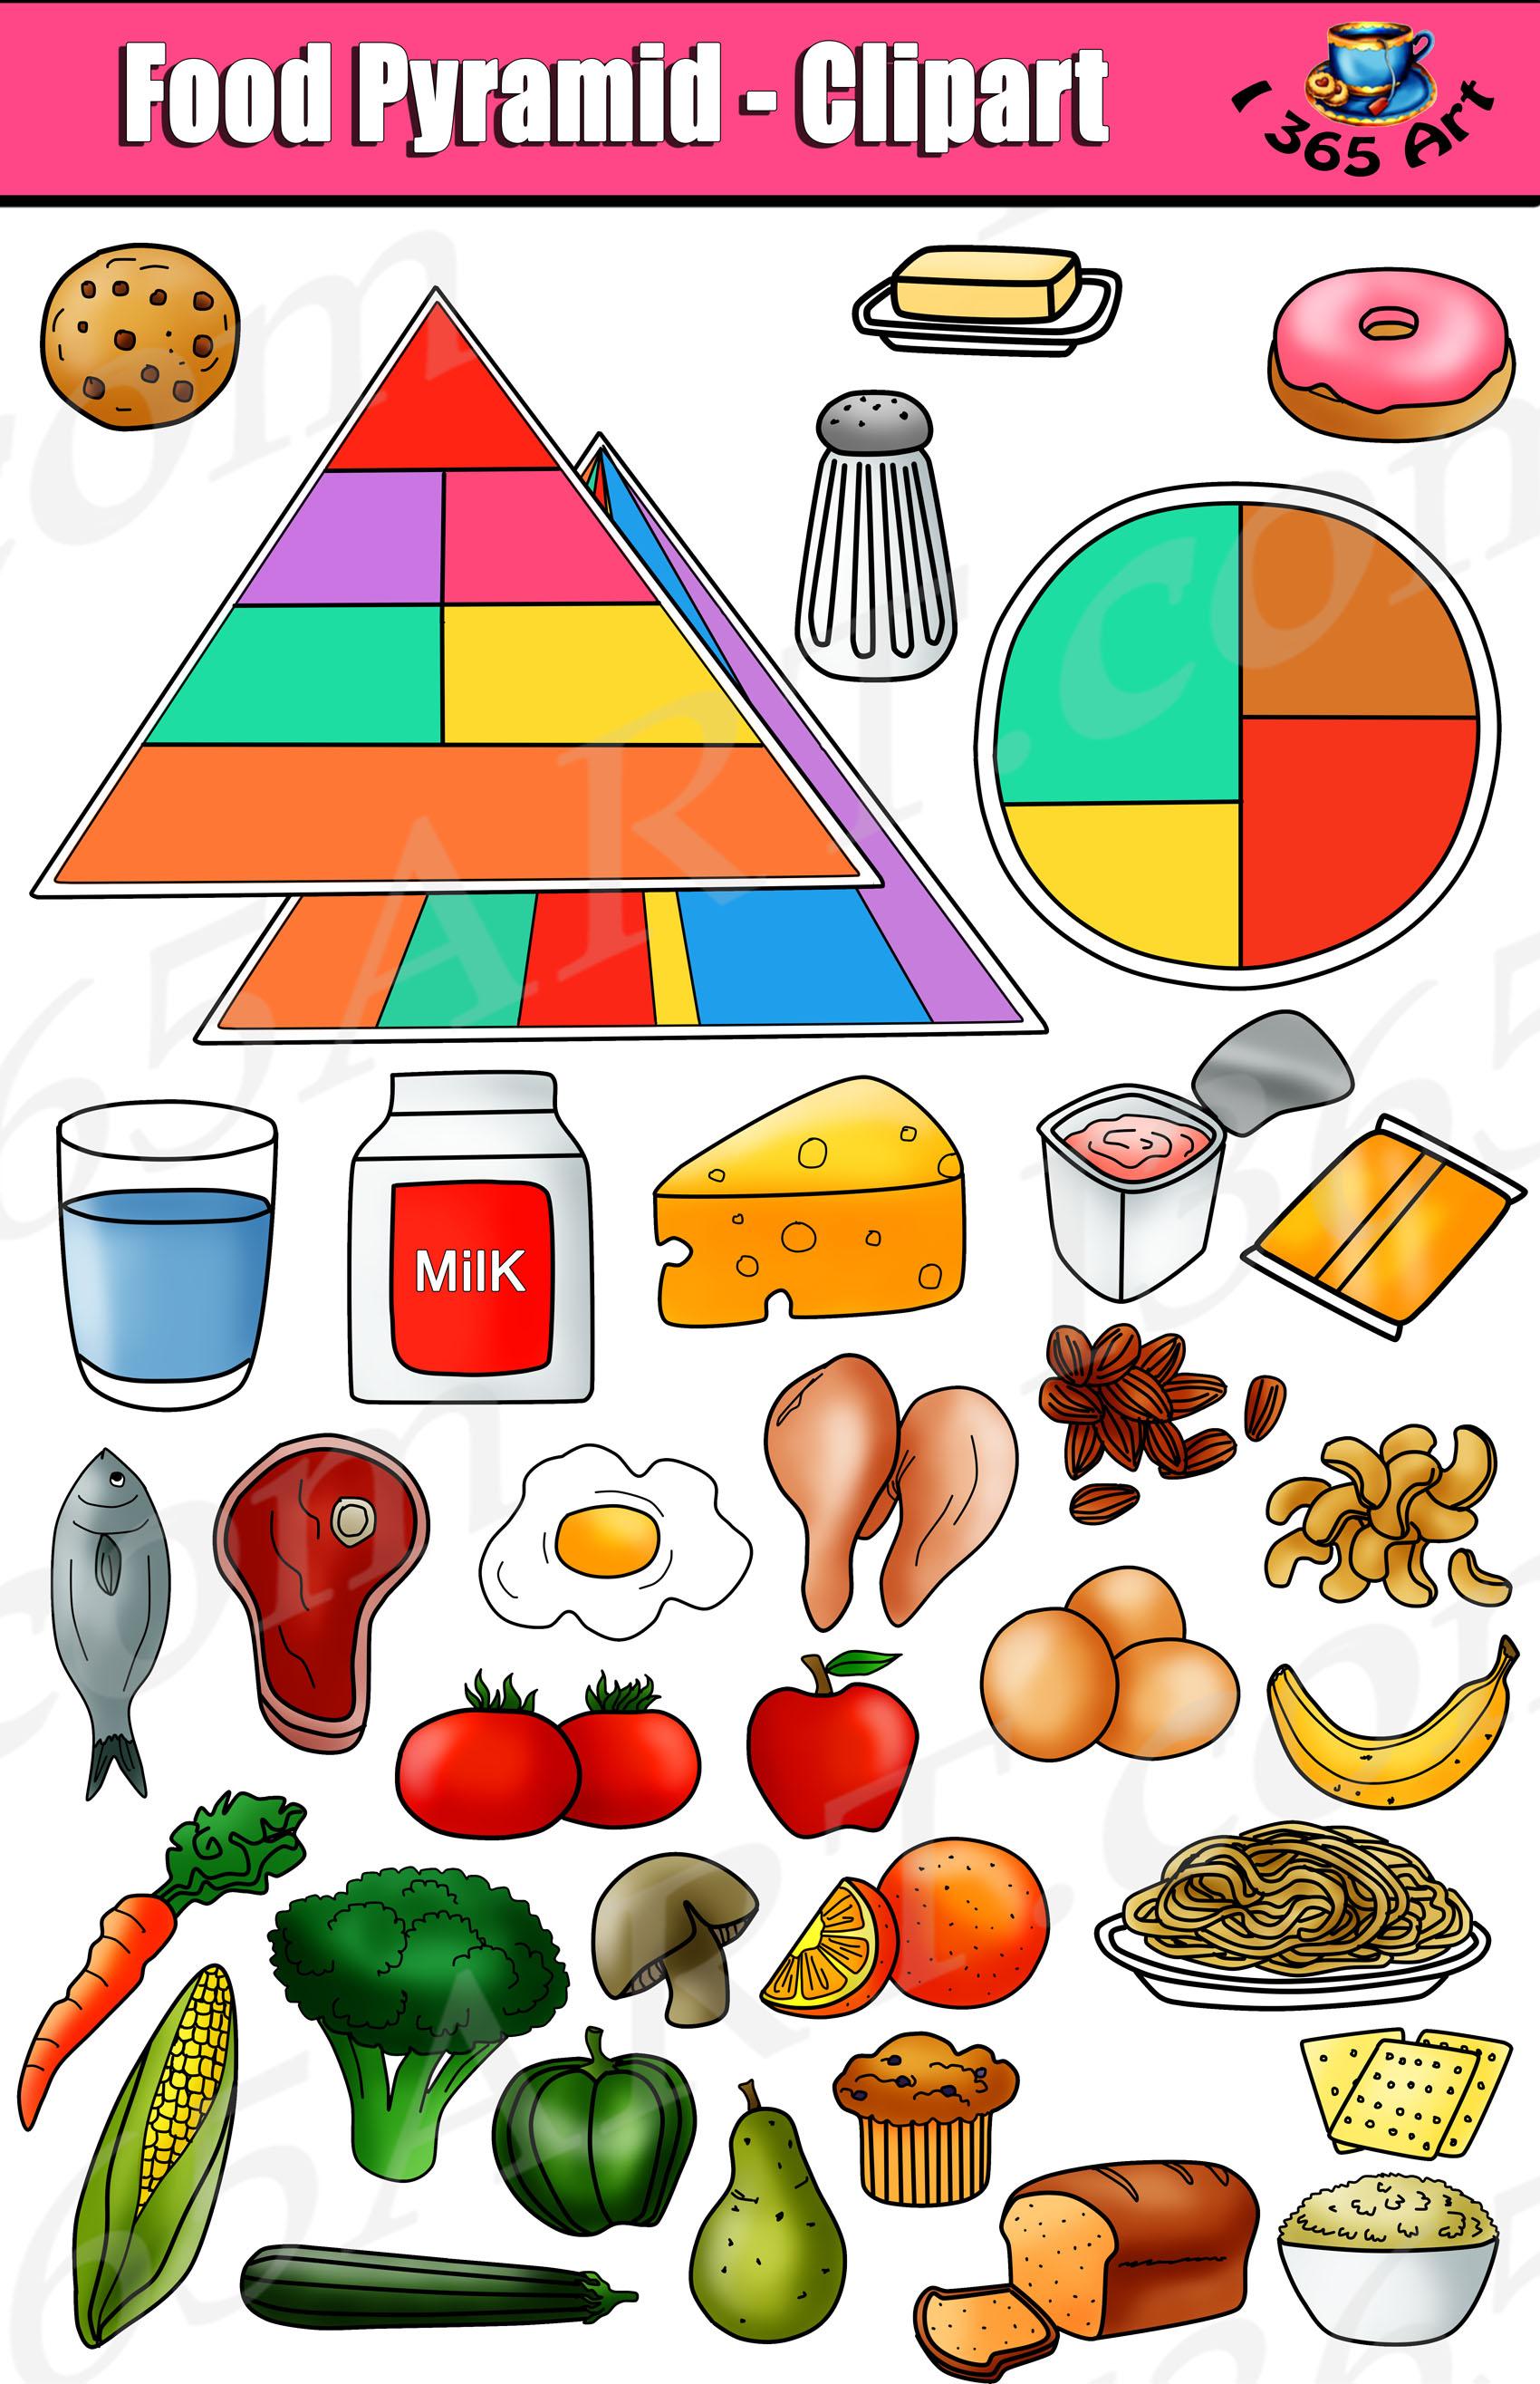 food pyramid clipart set kid s nutrition graphics clipart 4 school rh clipart4school com Canned Food Clip Art Food Clip Art